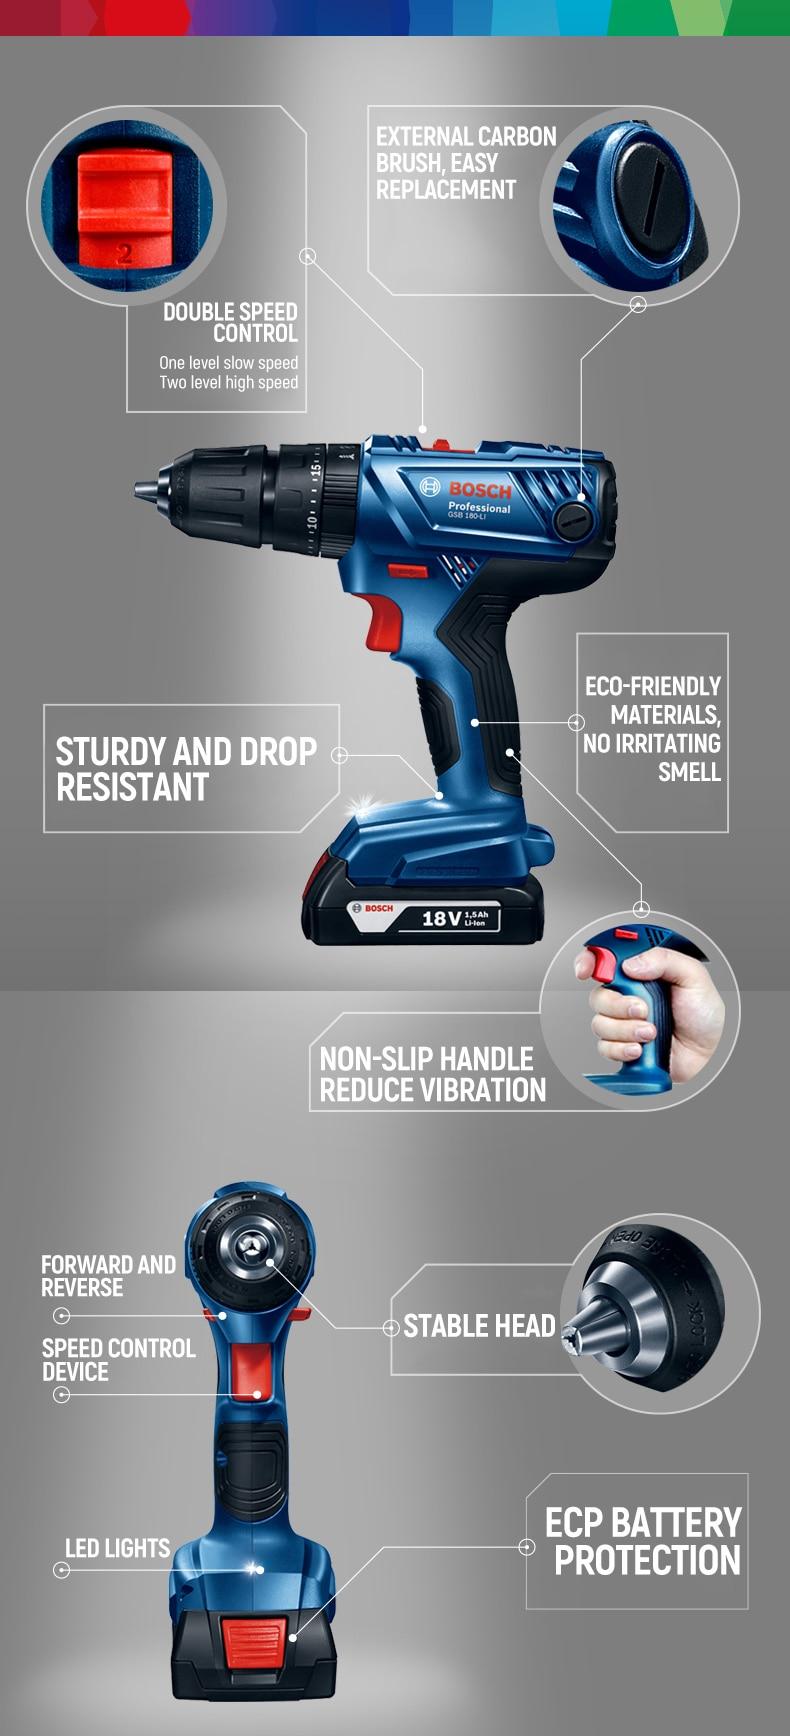 Bosch Cordless Electric Drill Driver 18V Max 50N.m